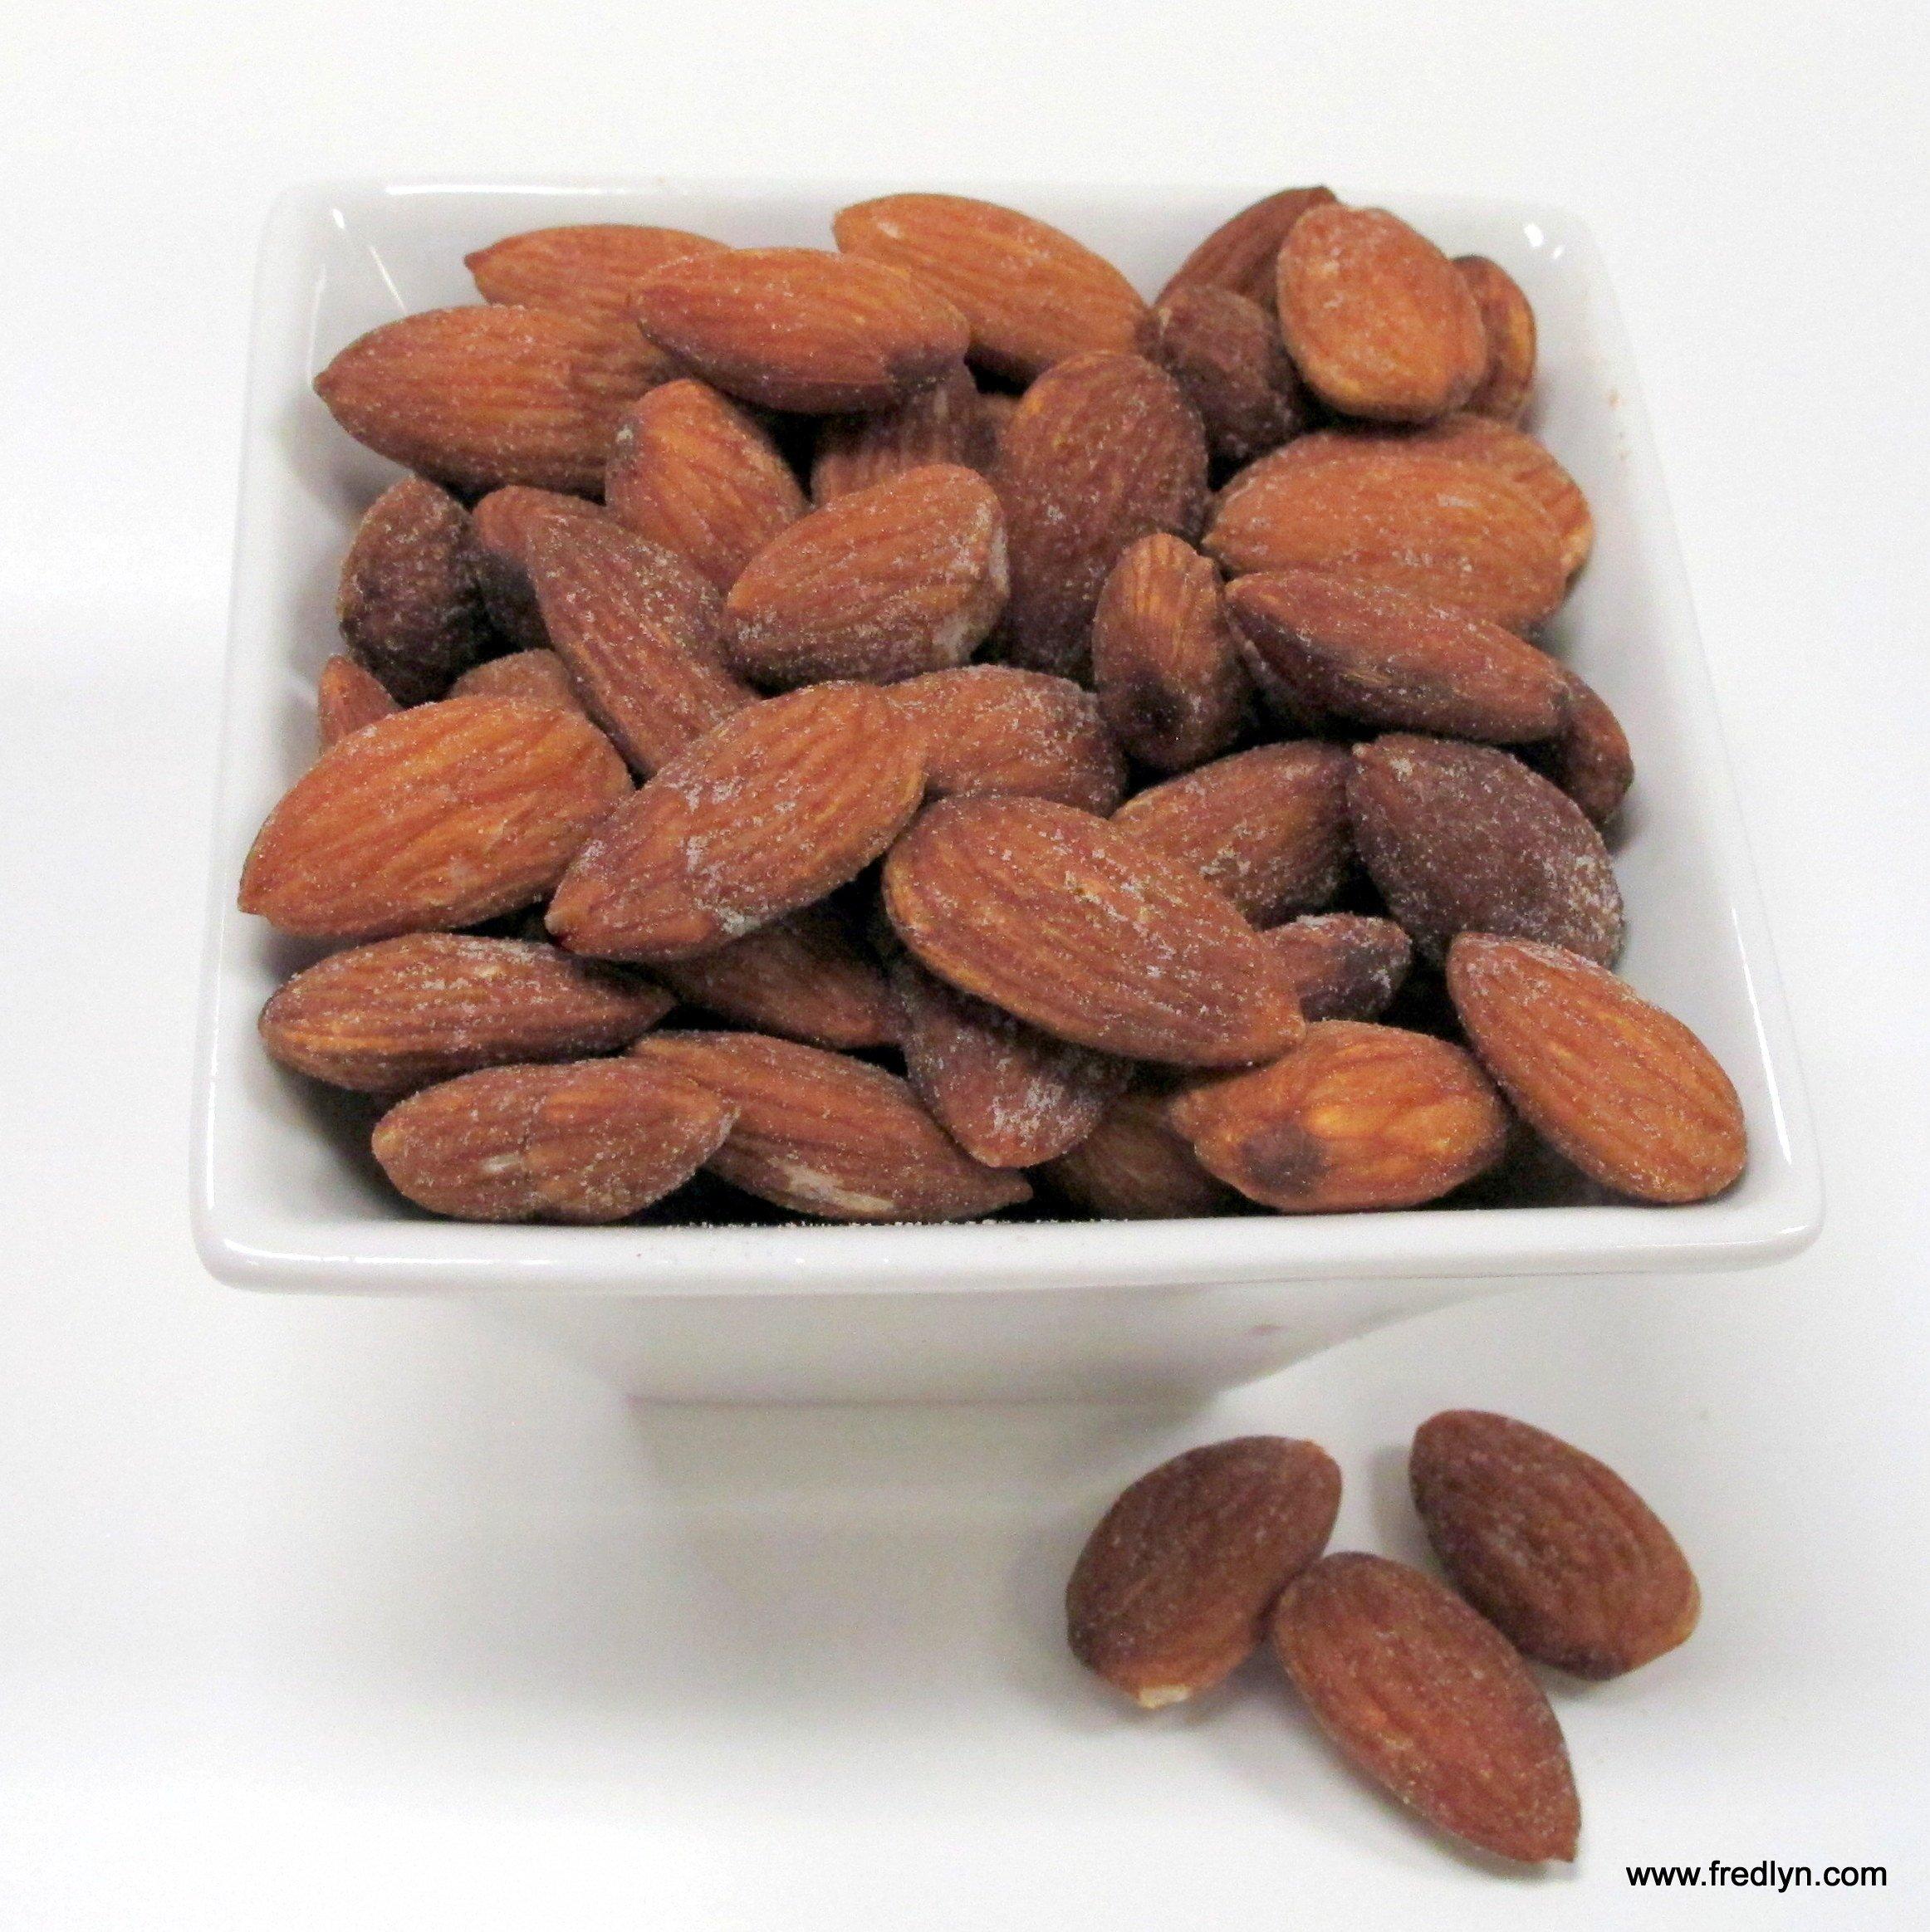 Roasted Salted Almonds, 5 Lb. Bulk Bag